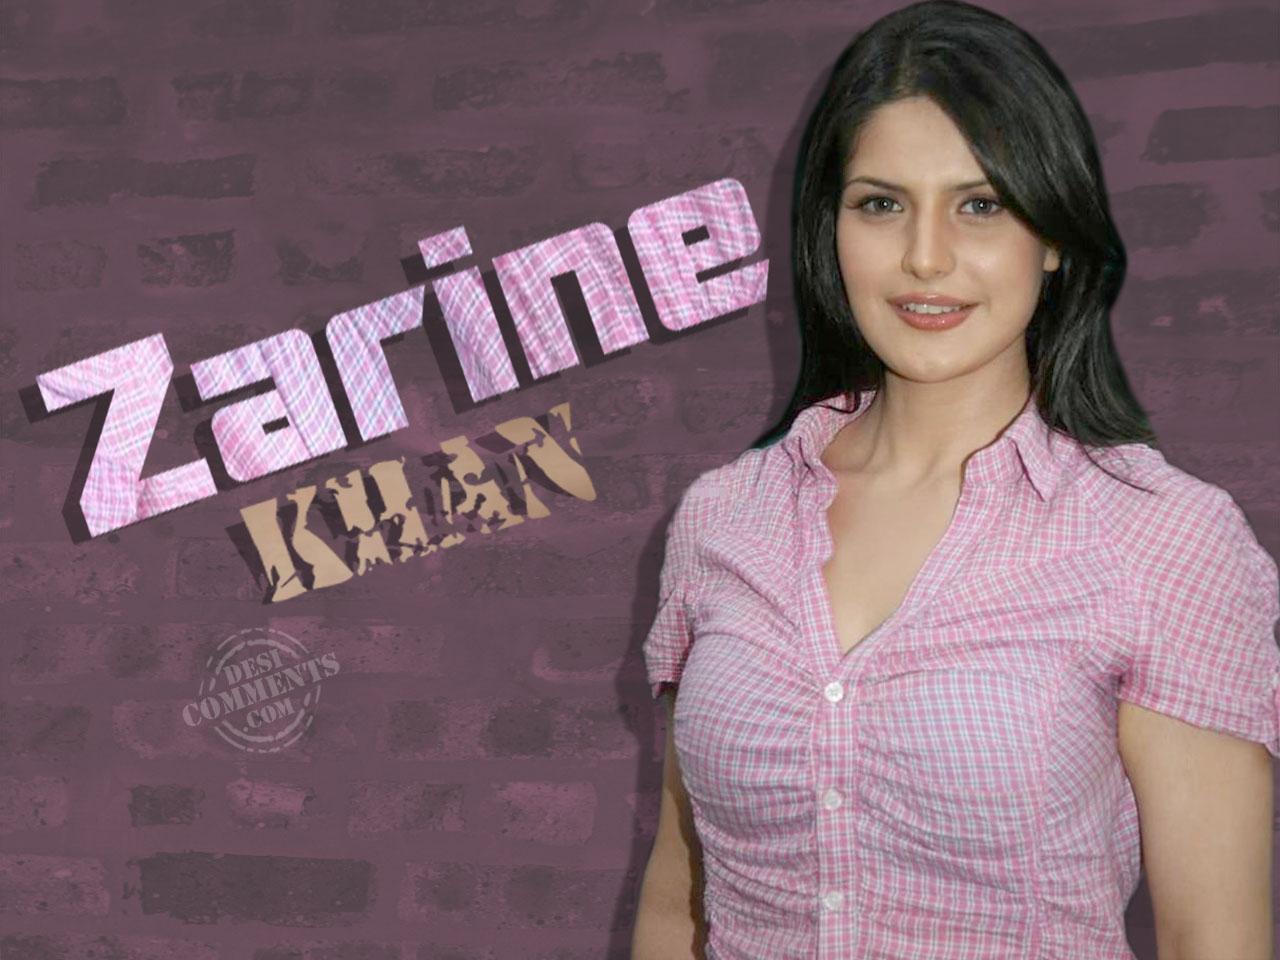 http://3.bp.blogspot.com/-VlRBaY7WAGg/Tdg24OZR7dI/AAAAAAAAAFU/cz47PqxBP0A/s1600/Zarine-Khan-Wallpaper-6.jpg